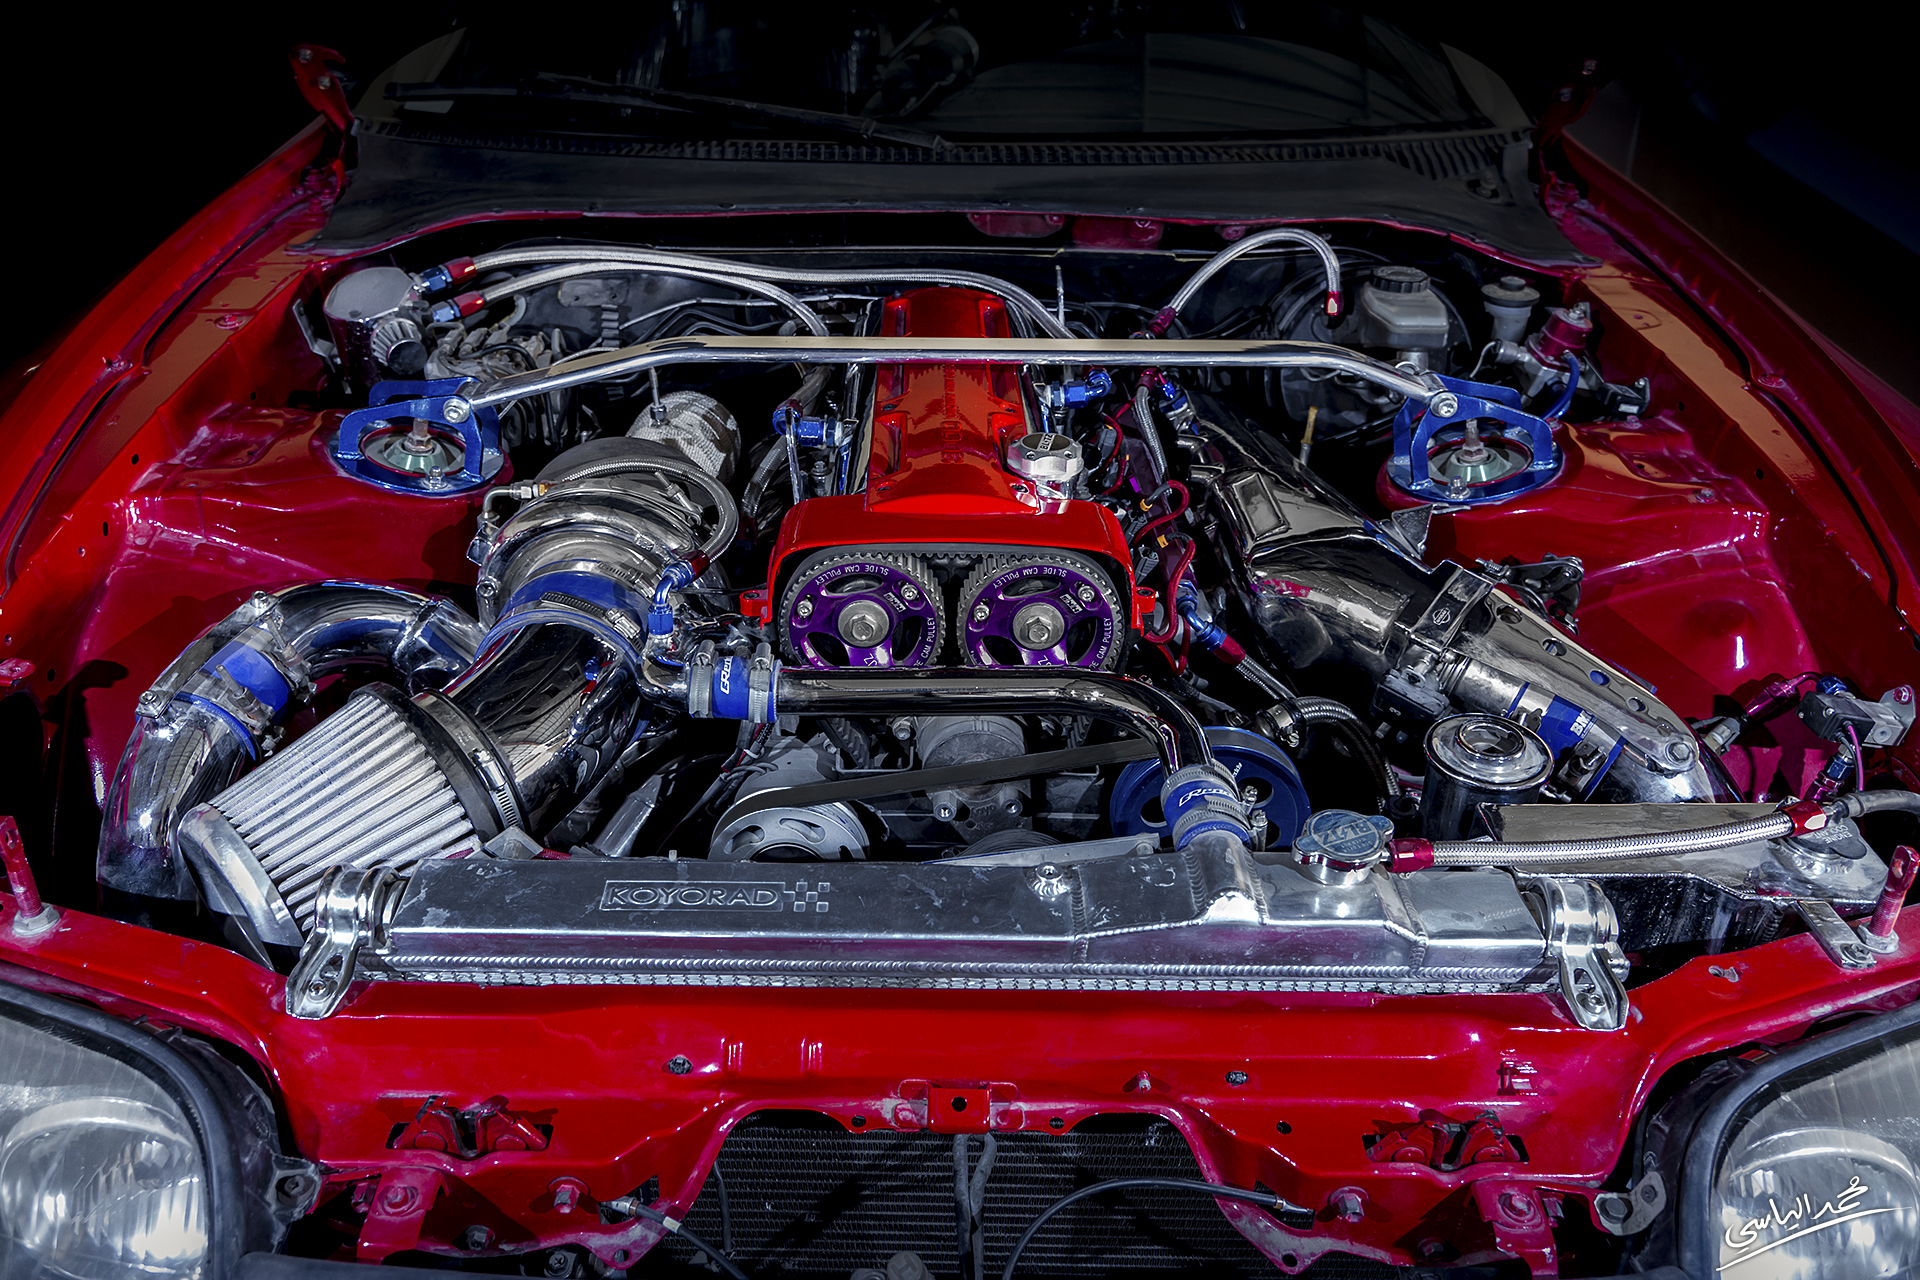 2017 Toyota Supra >> 2JZ Single Turbo by JamesDubai on DeviantArt